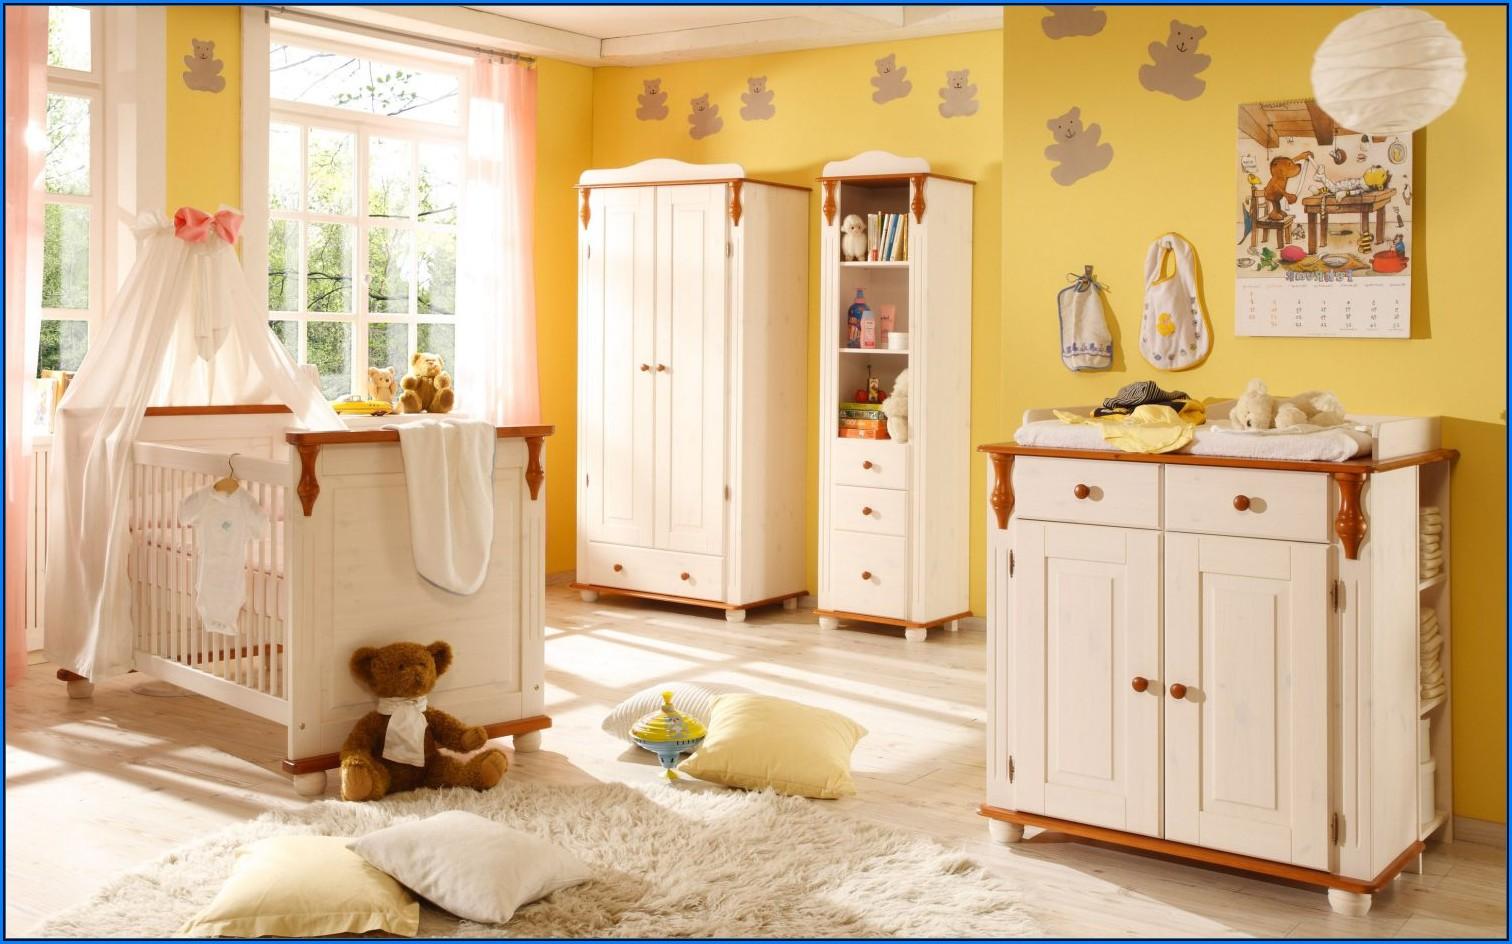 Babyzimmer Gestaltung Wandfarbe